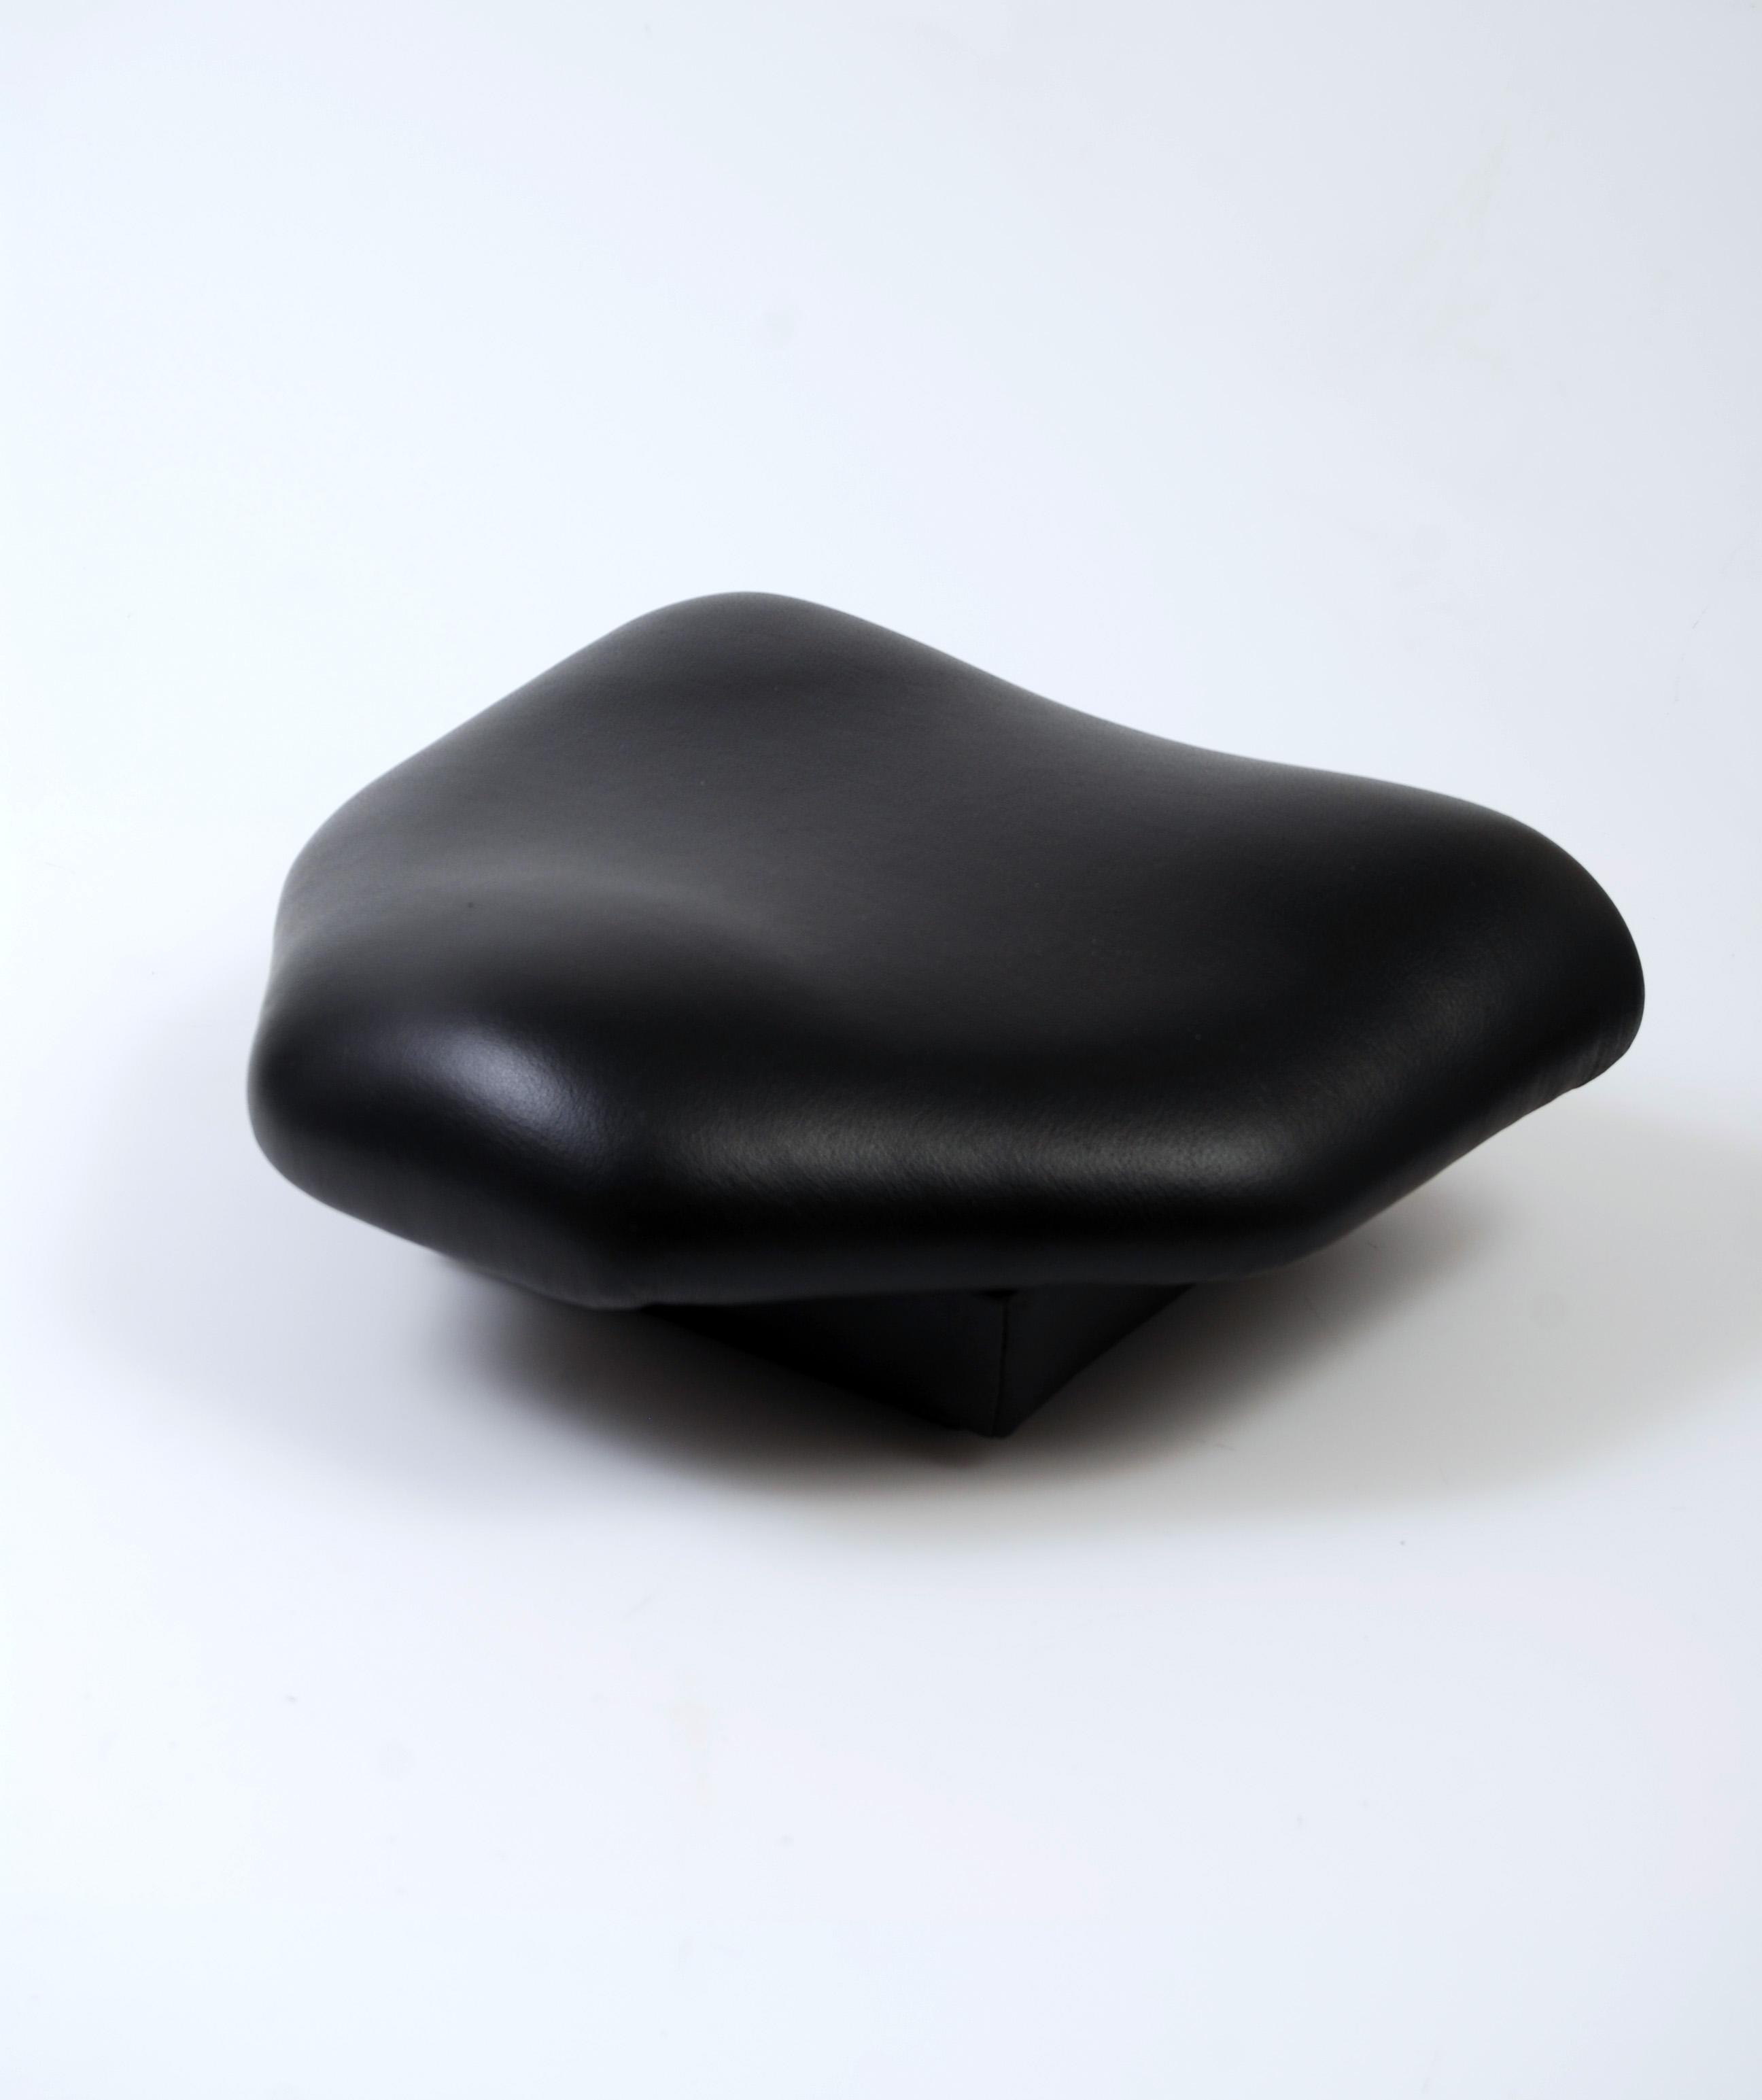 Groovy Wobble Chair Therapeutic Portable Inzonedesignstudio Interior Chair Design Inzonedesignstudiocom